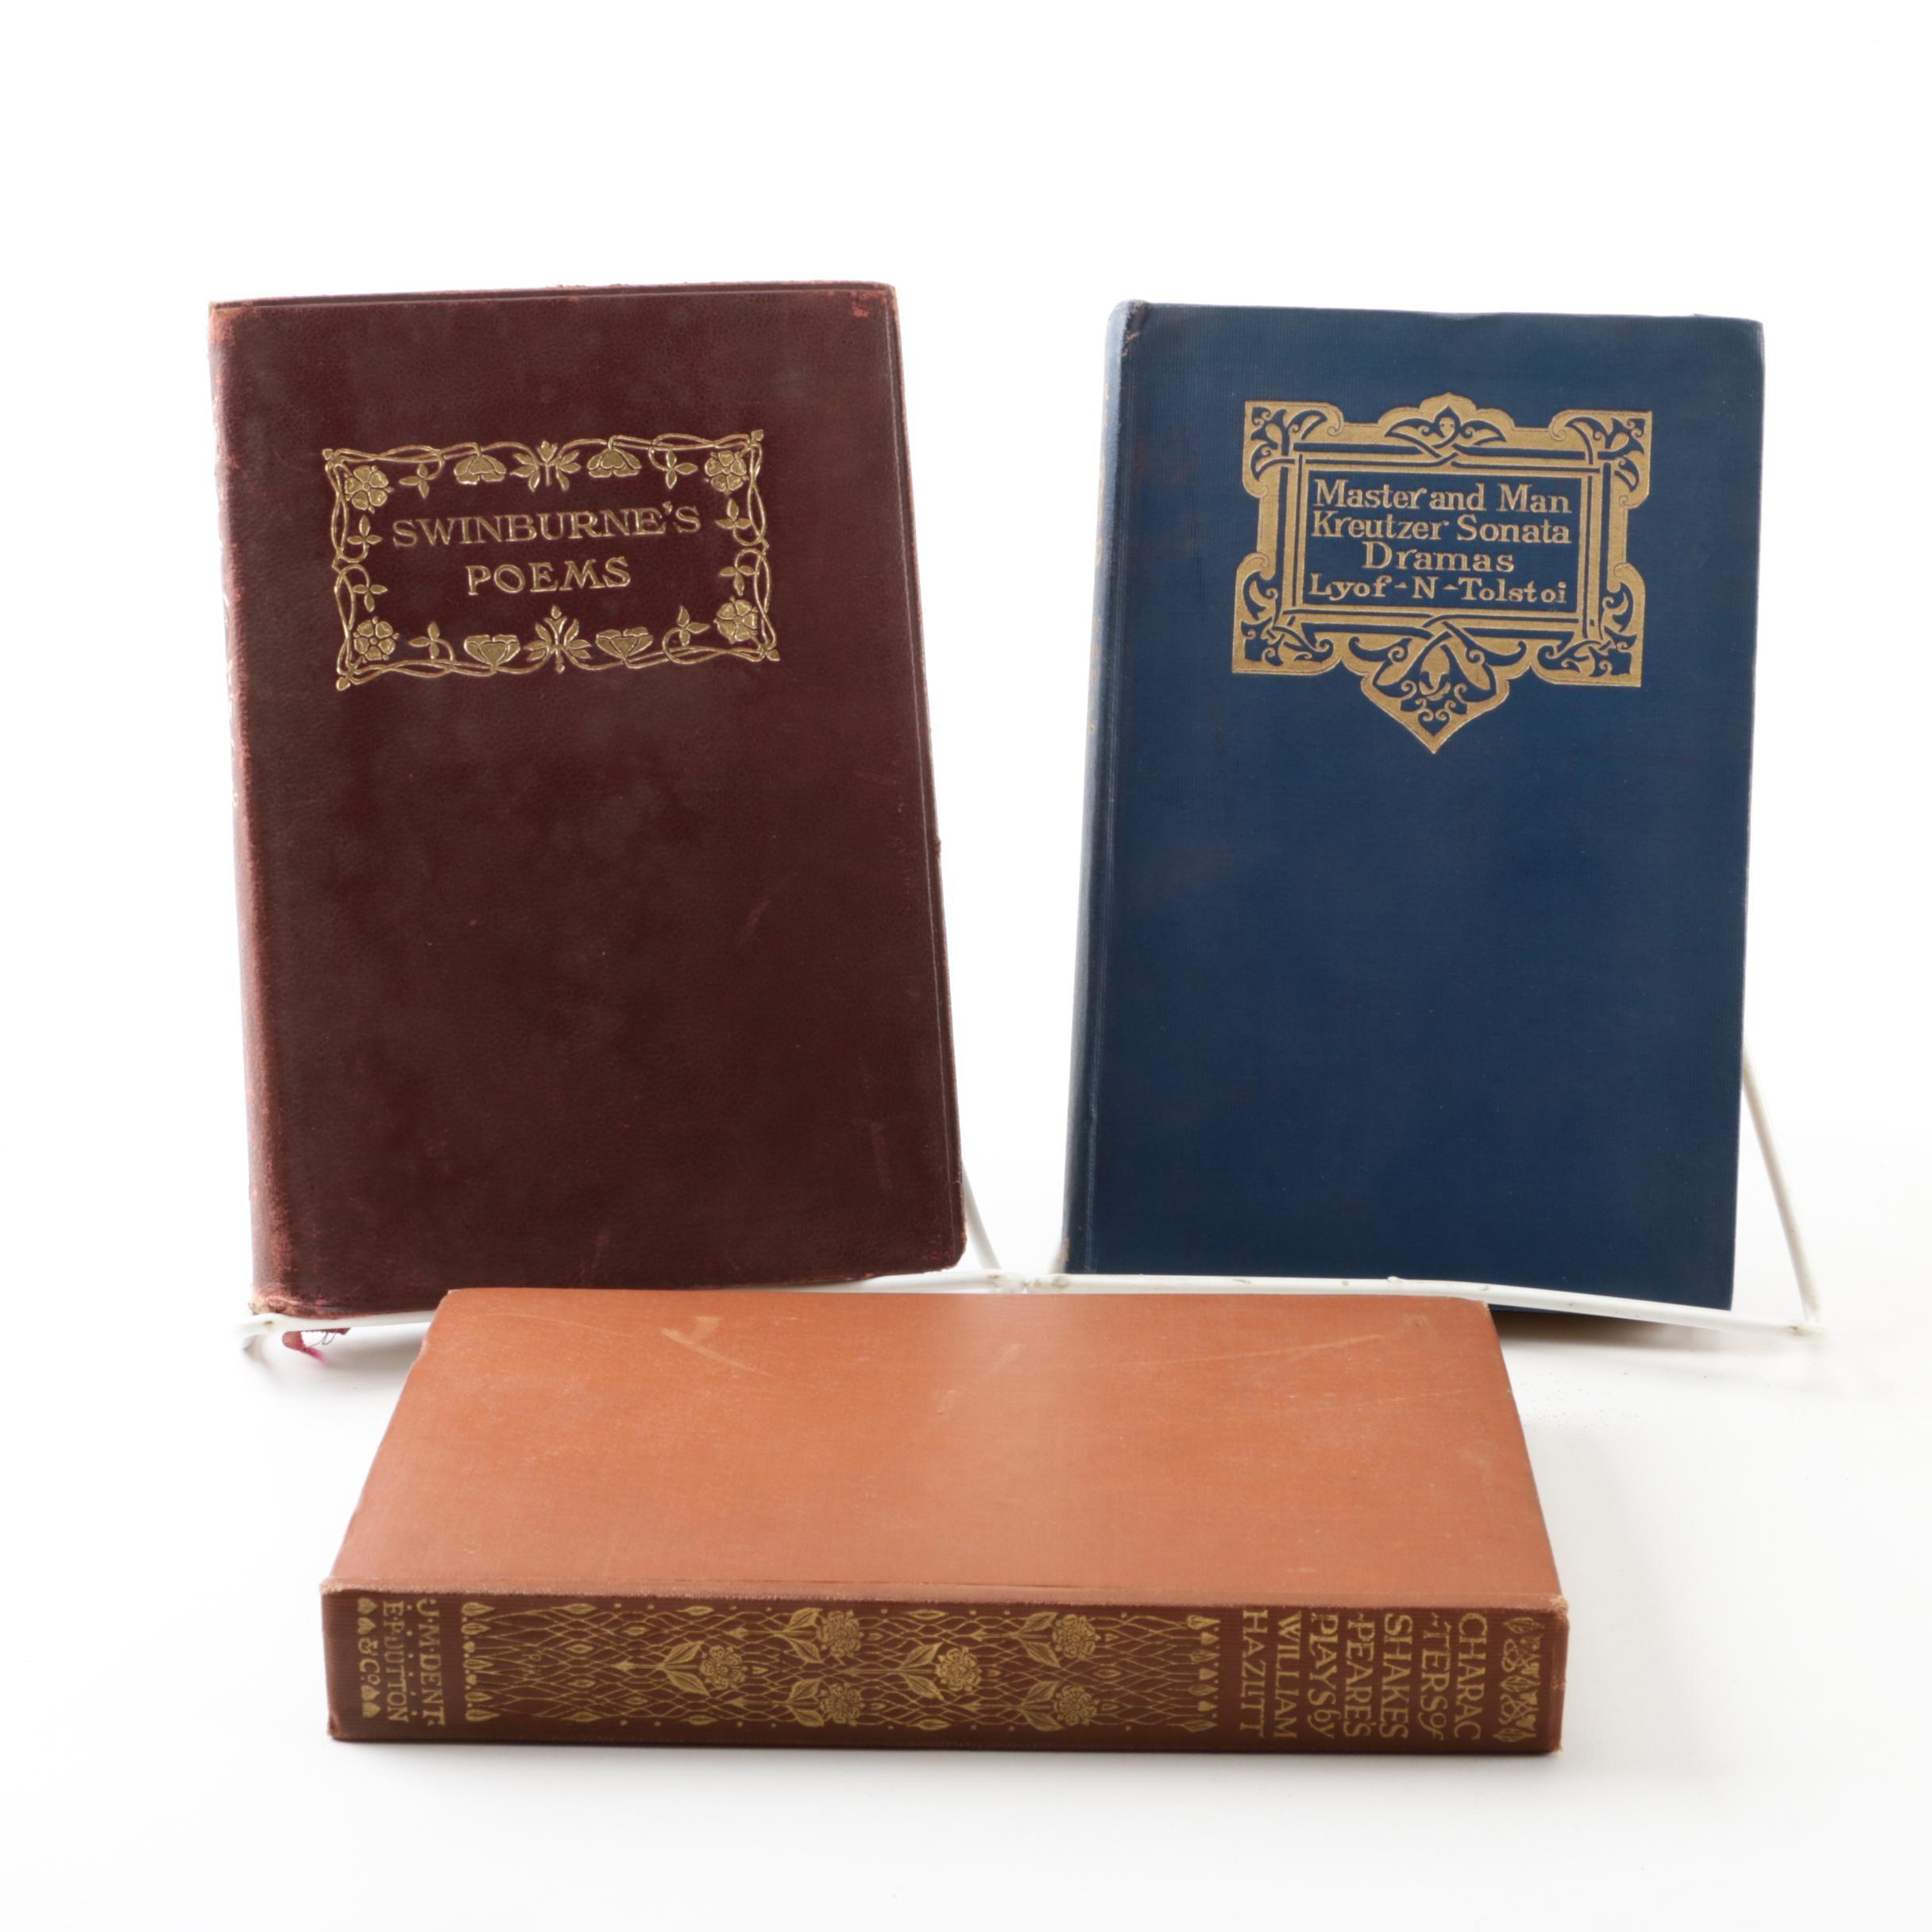 Antique Volumes of Swinburne, Hazlitt and Tolstoy